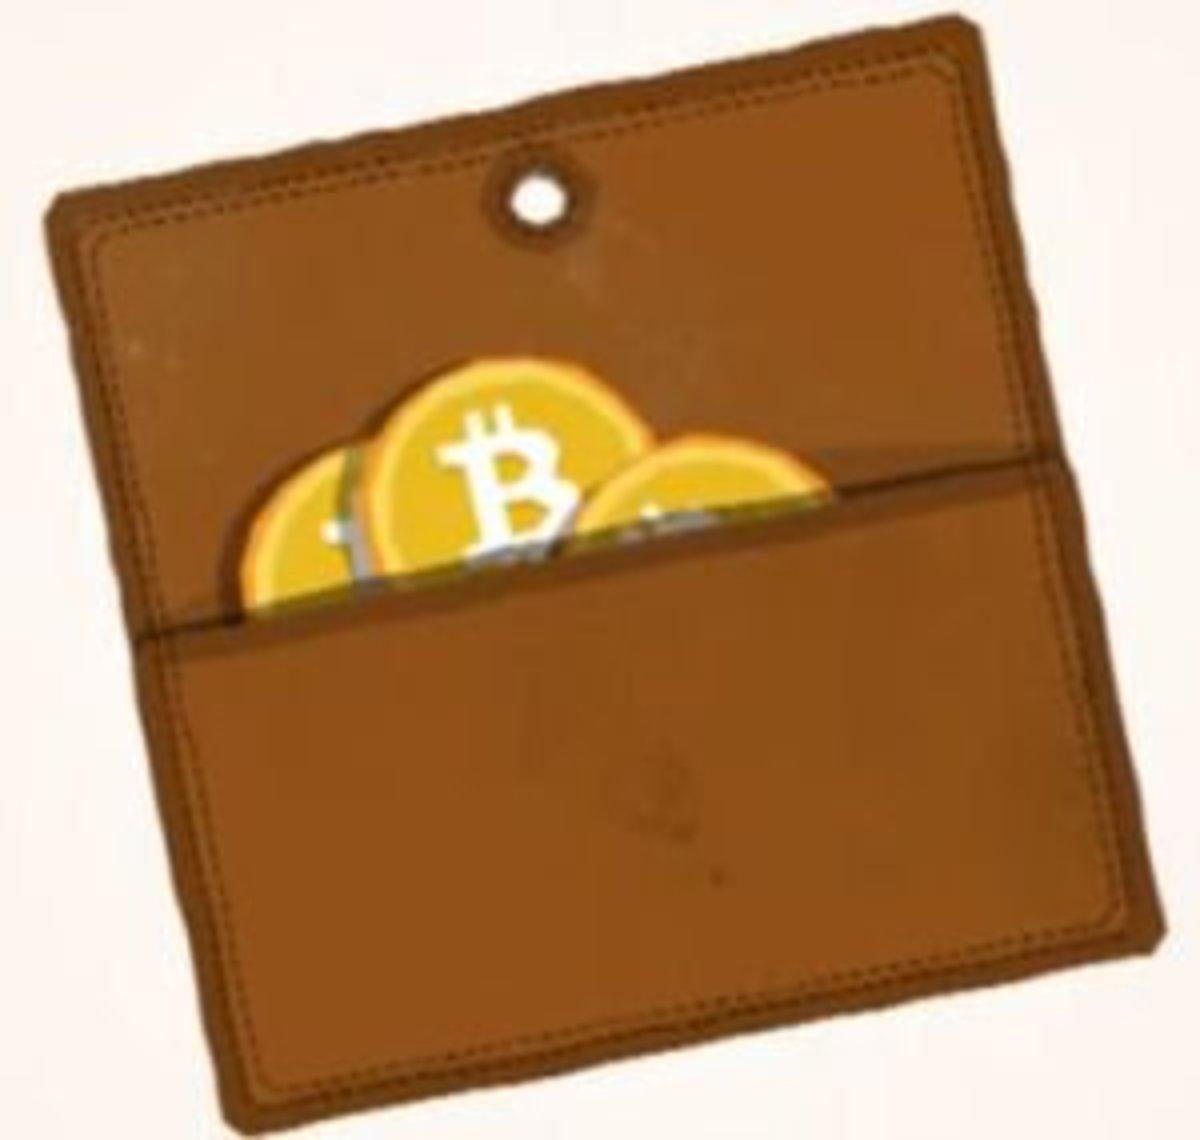 Op-ed - Deterministic Wallets